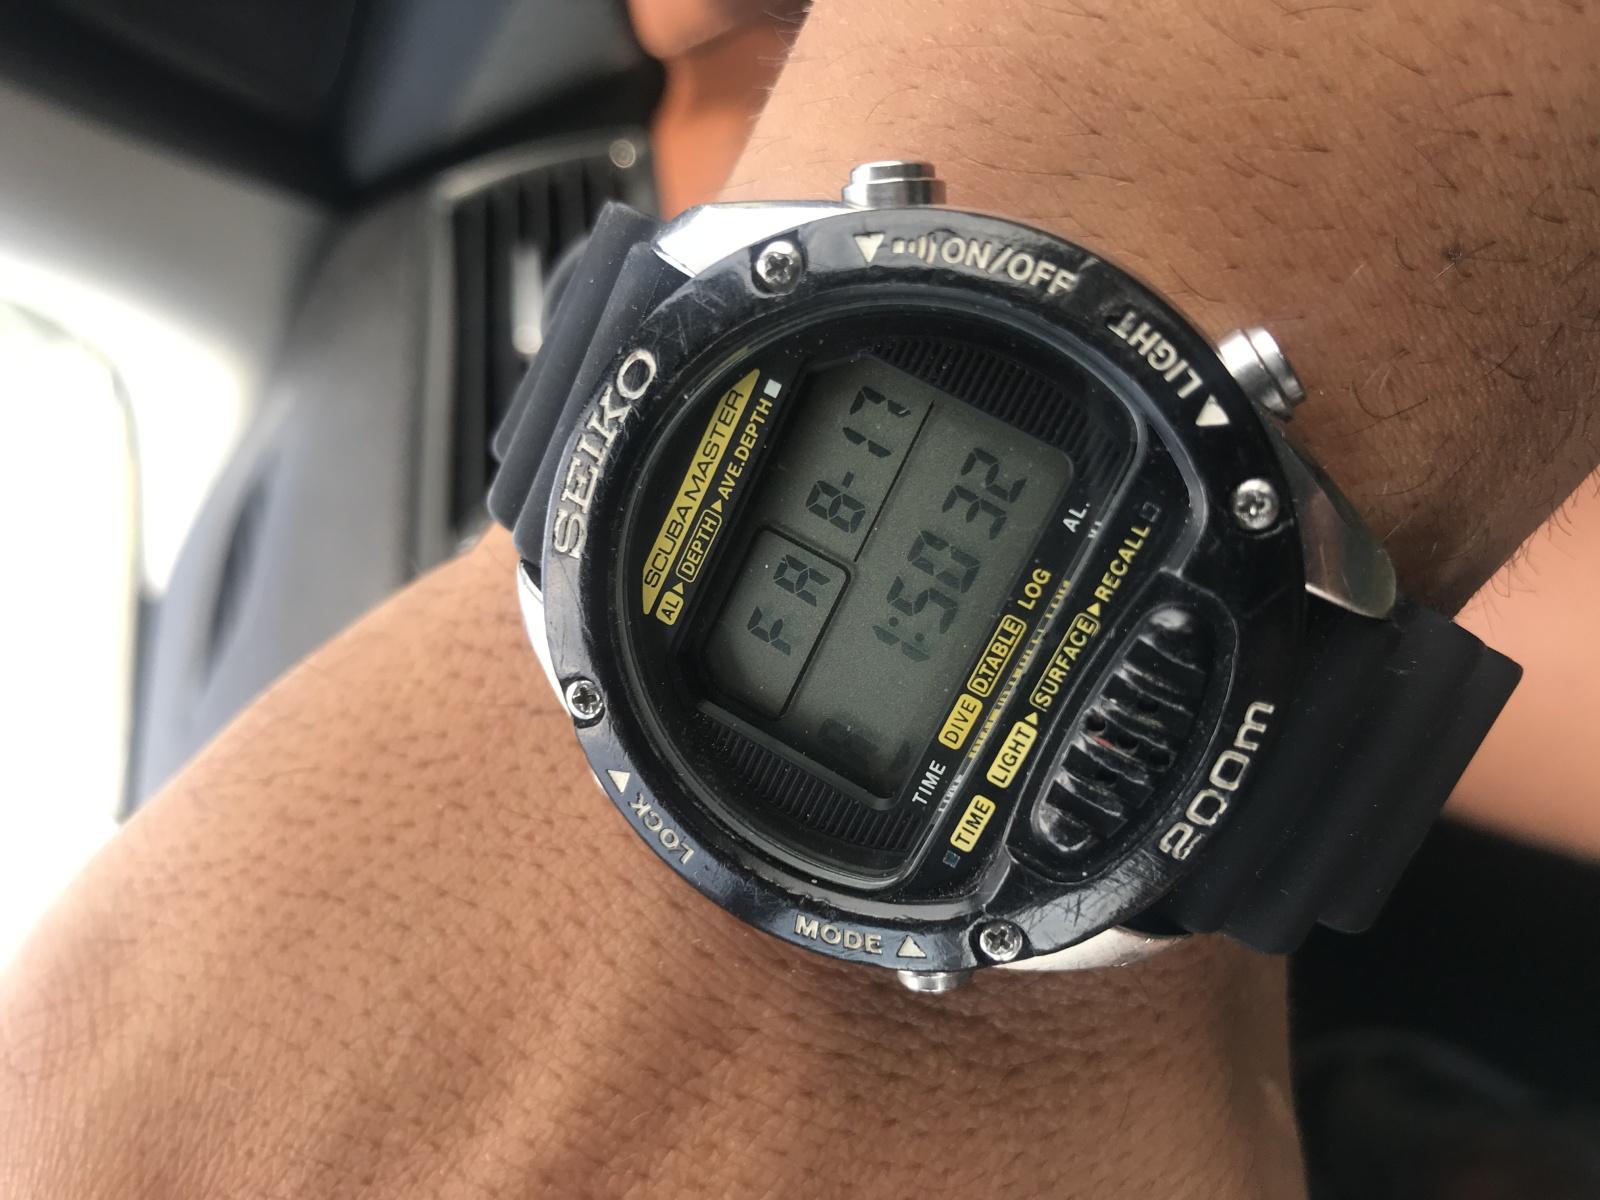 SEIKO M705 vs CASIO DEP 610? 2gwuv68